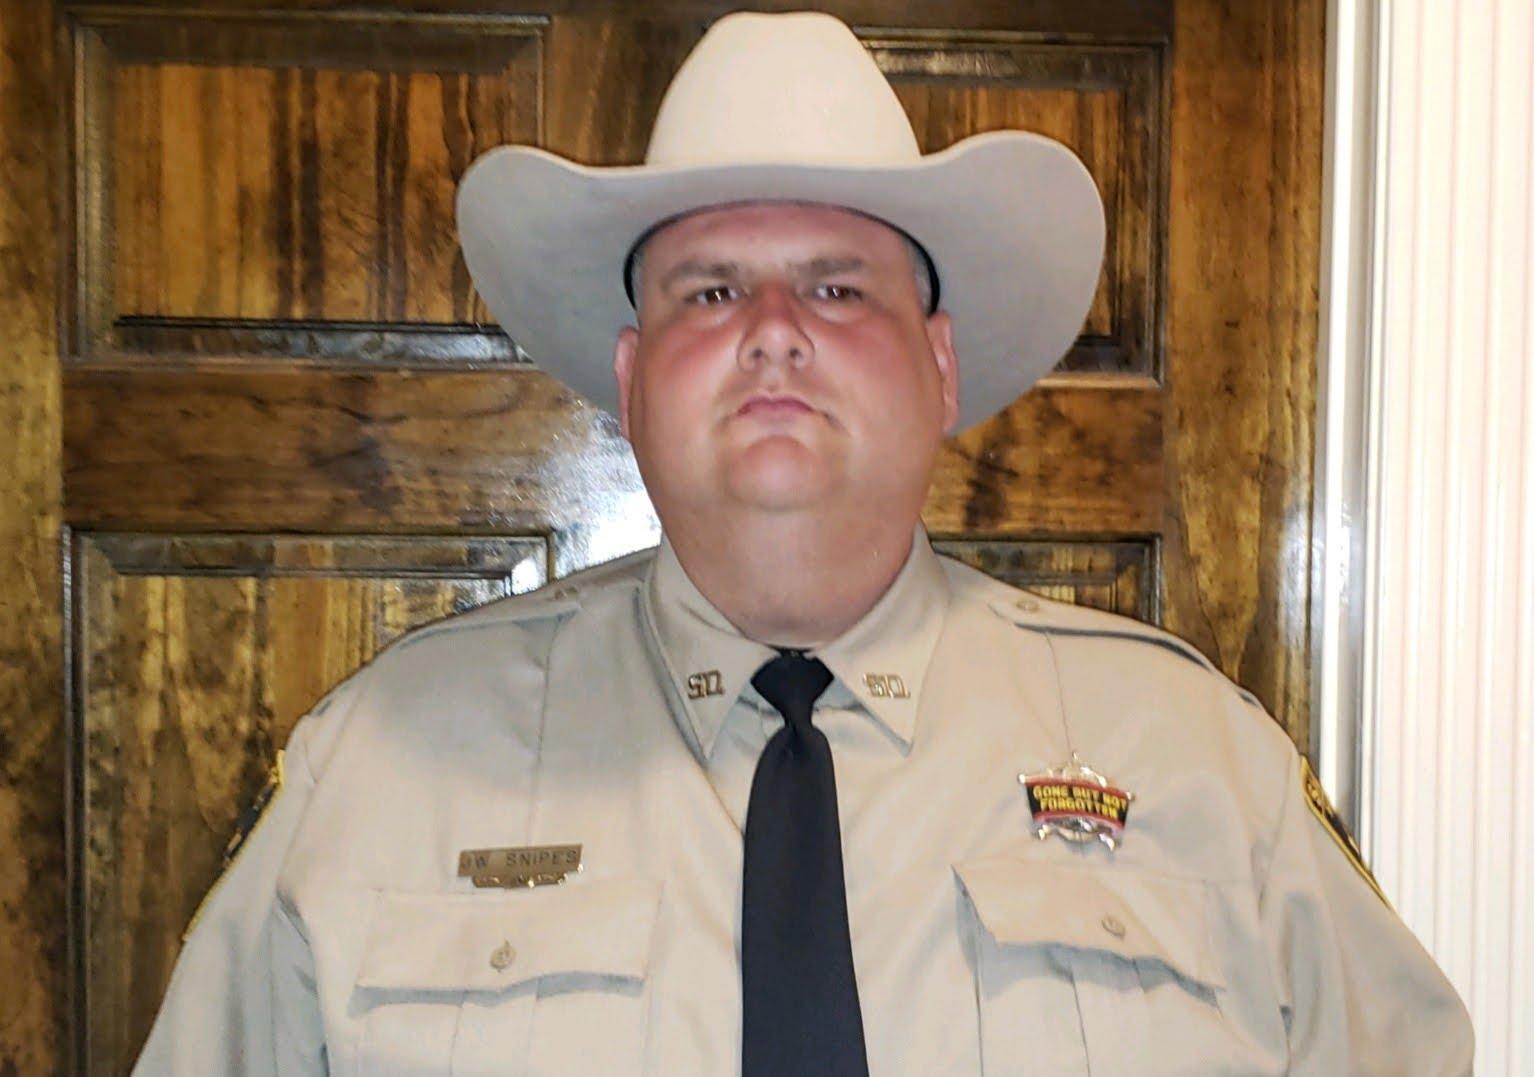 Deputy Jason Snipes, San Jacinto County Texas Animal Control Officer